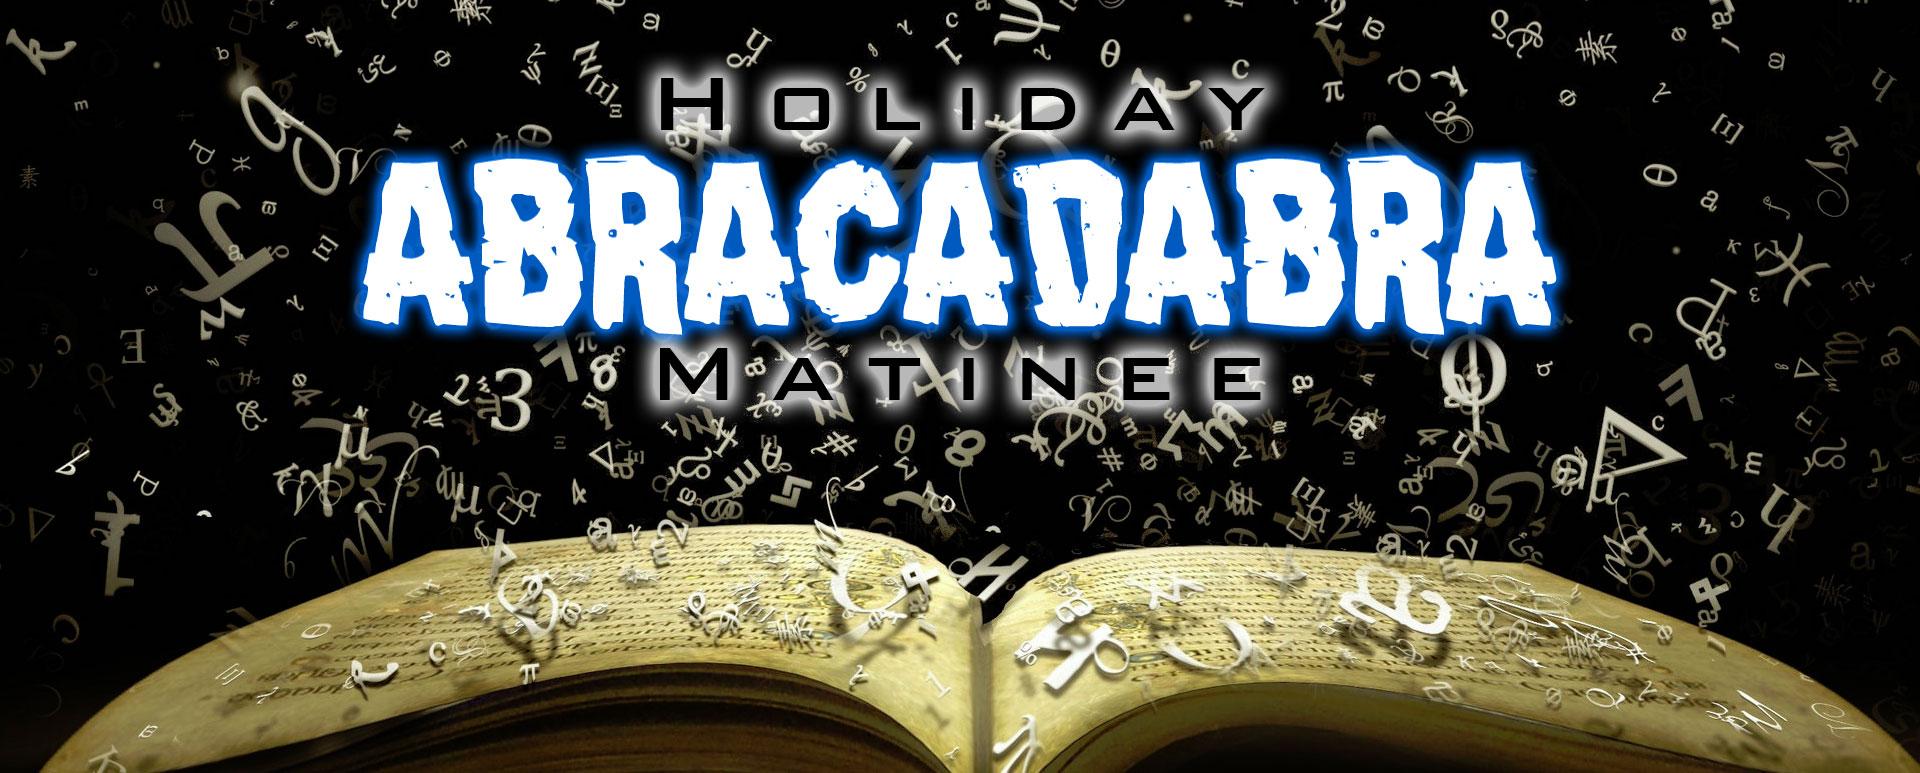 Holiday Abracadabra Matinee